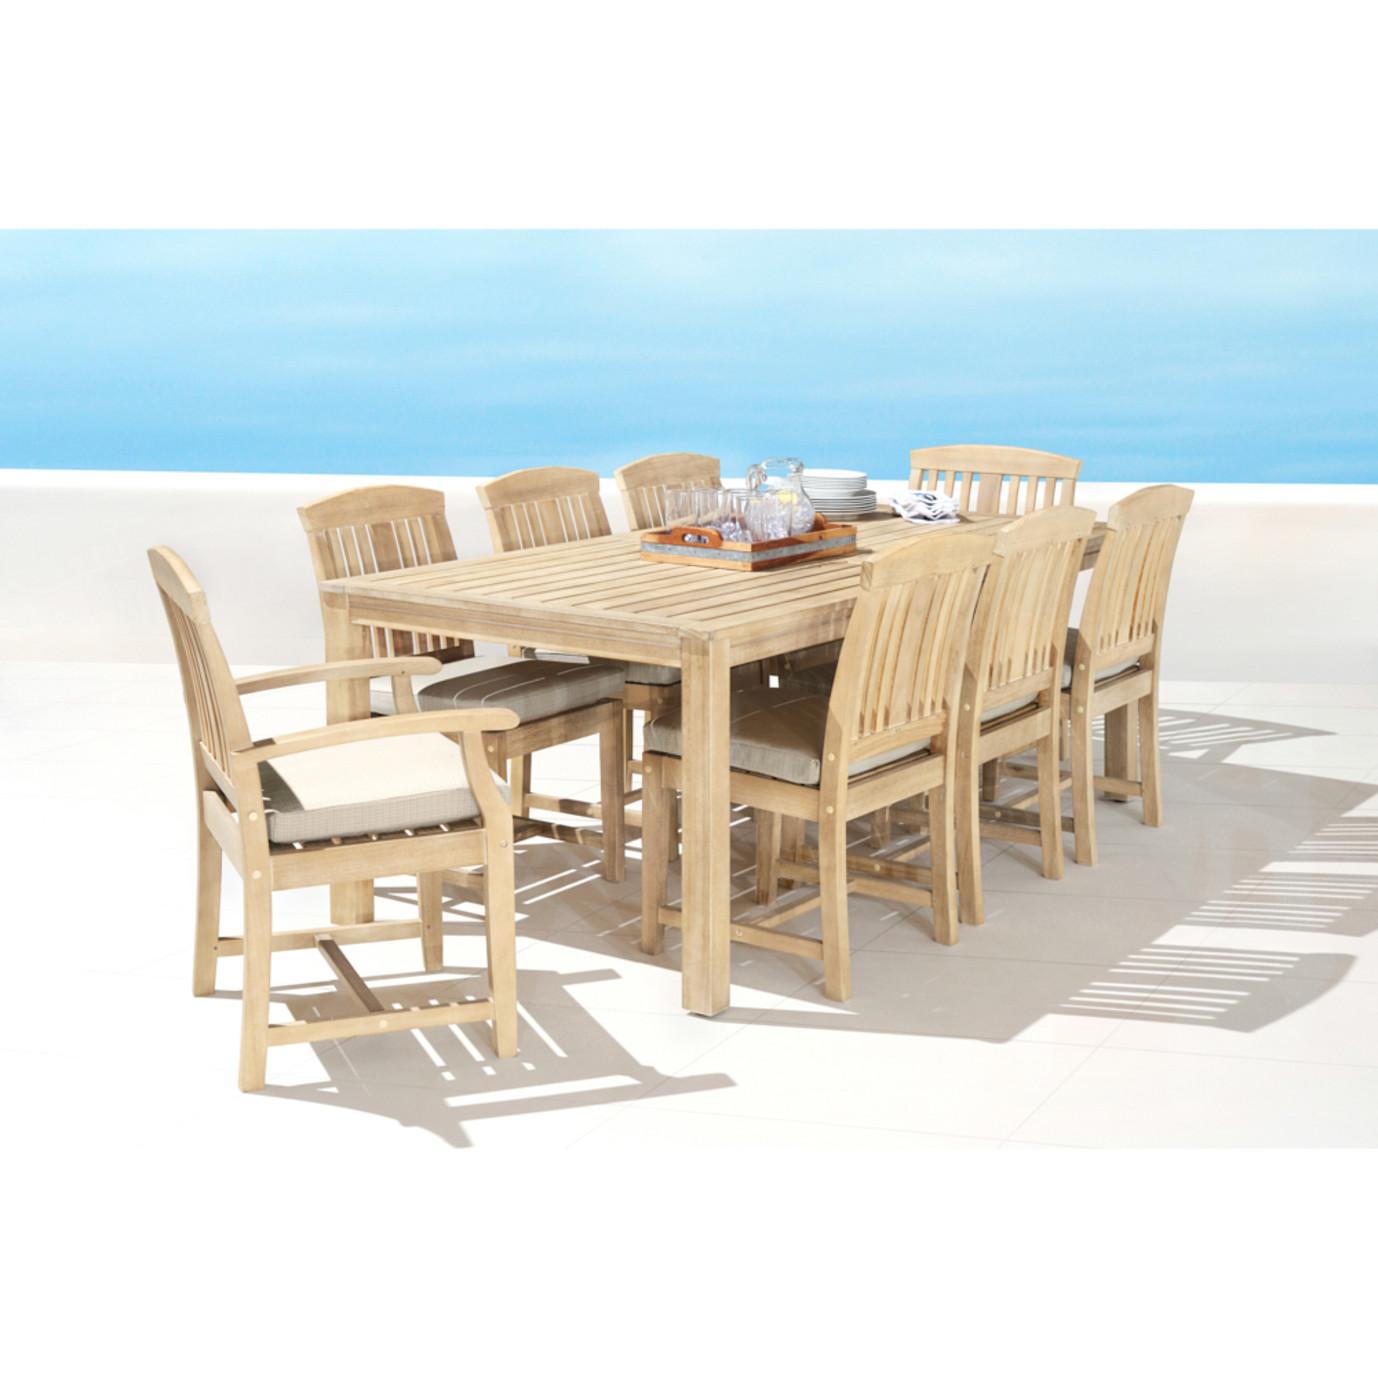 Kooper 9pc Outdoor Dining Set - Slate Gray